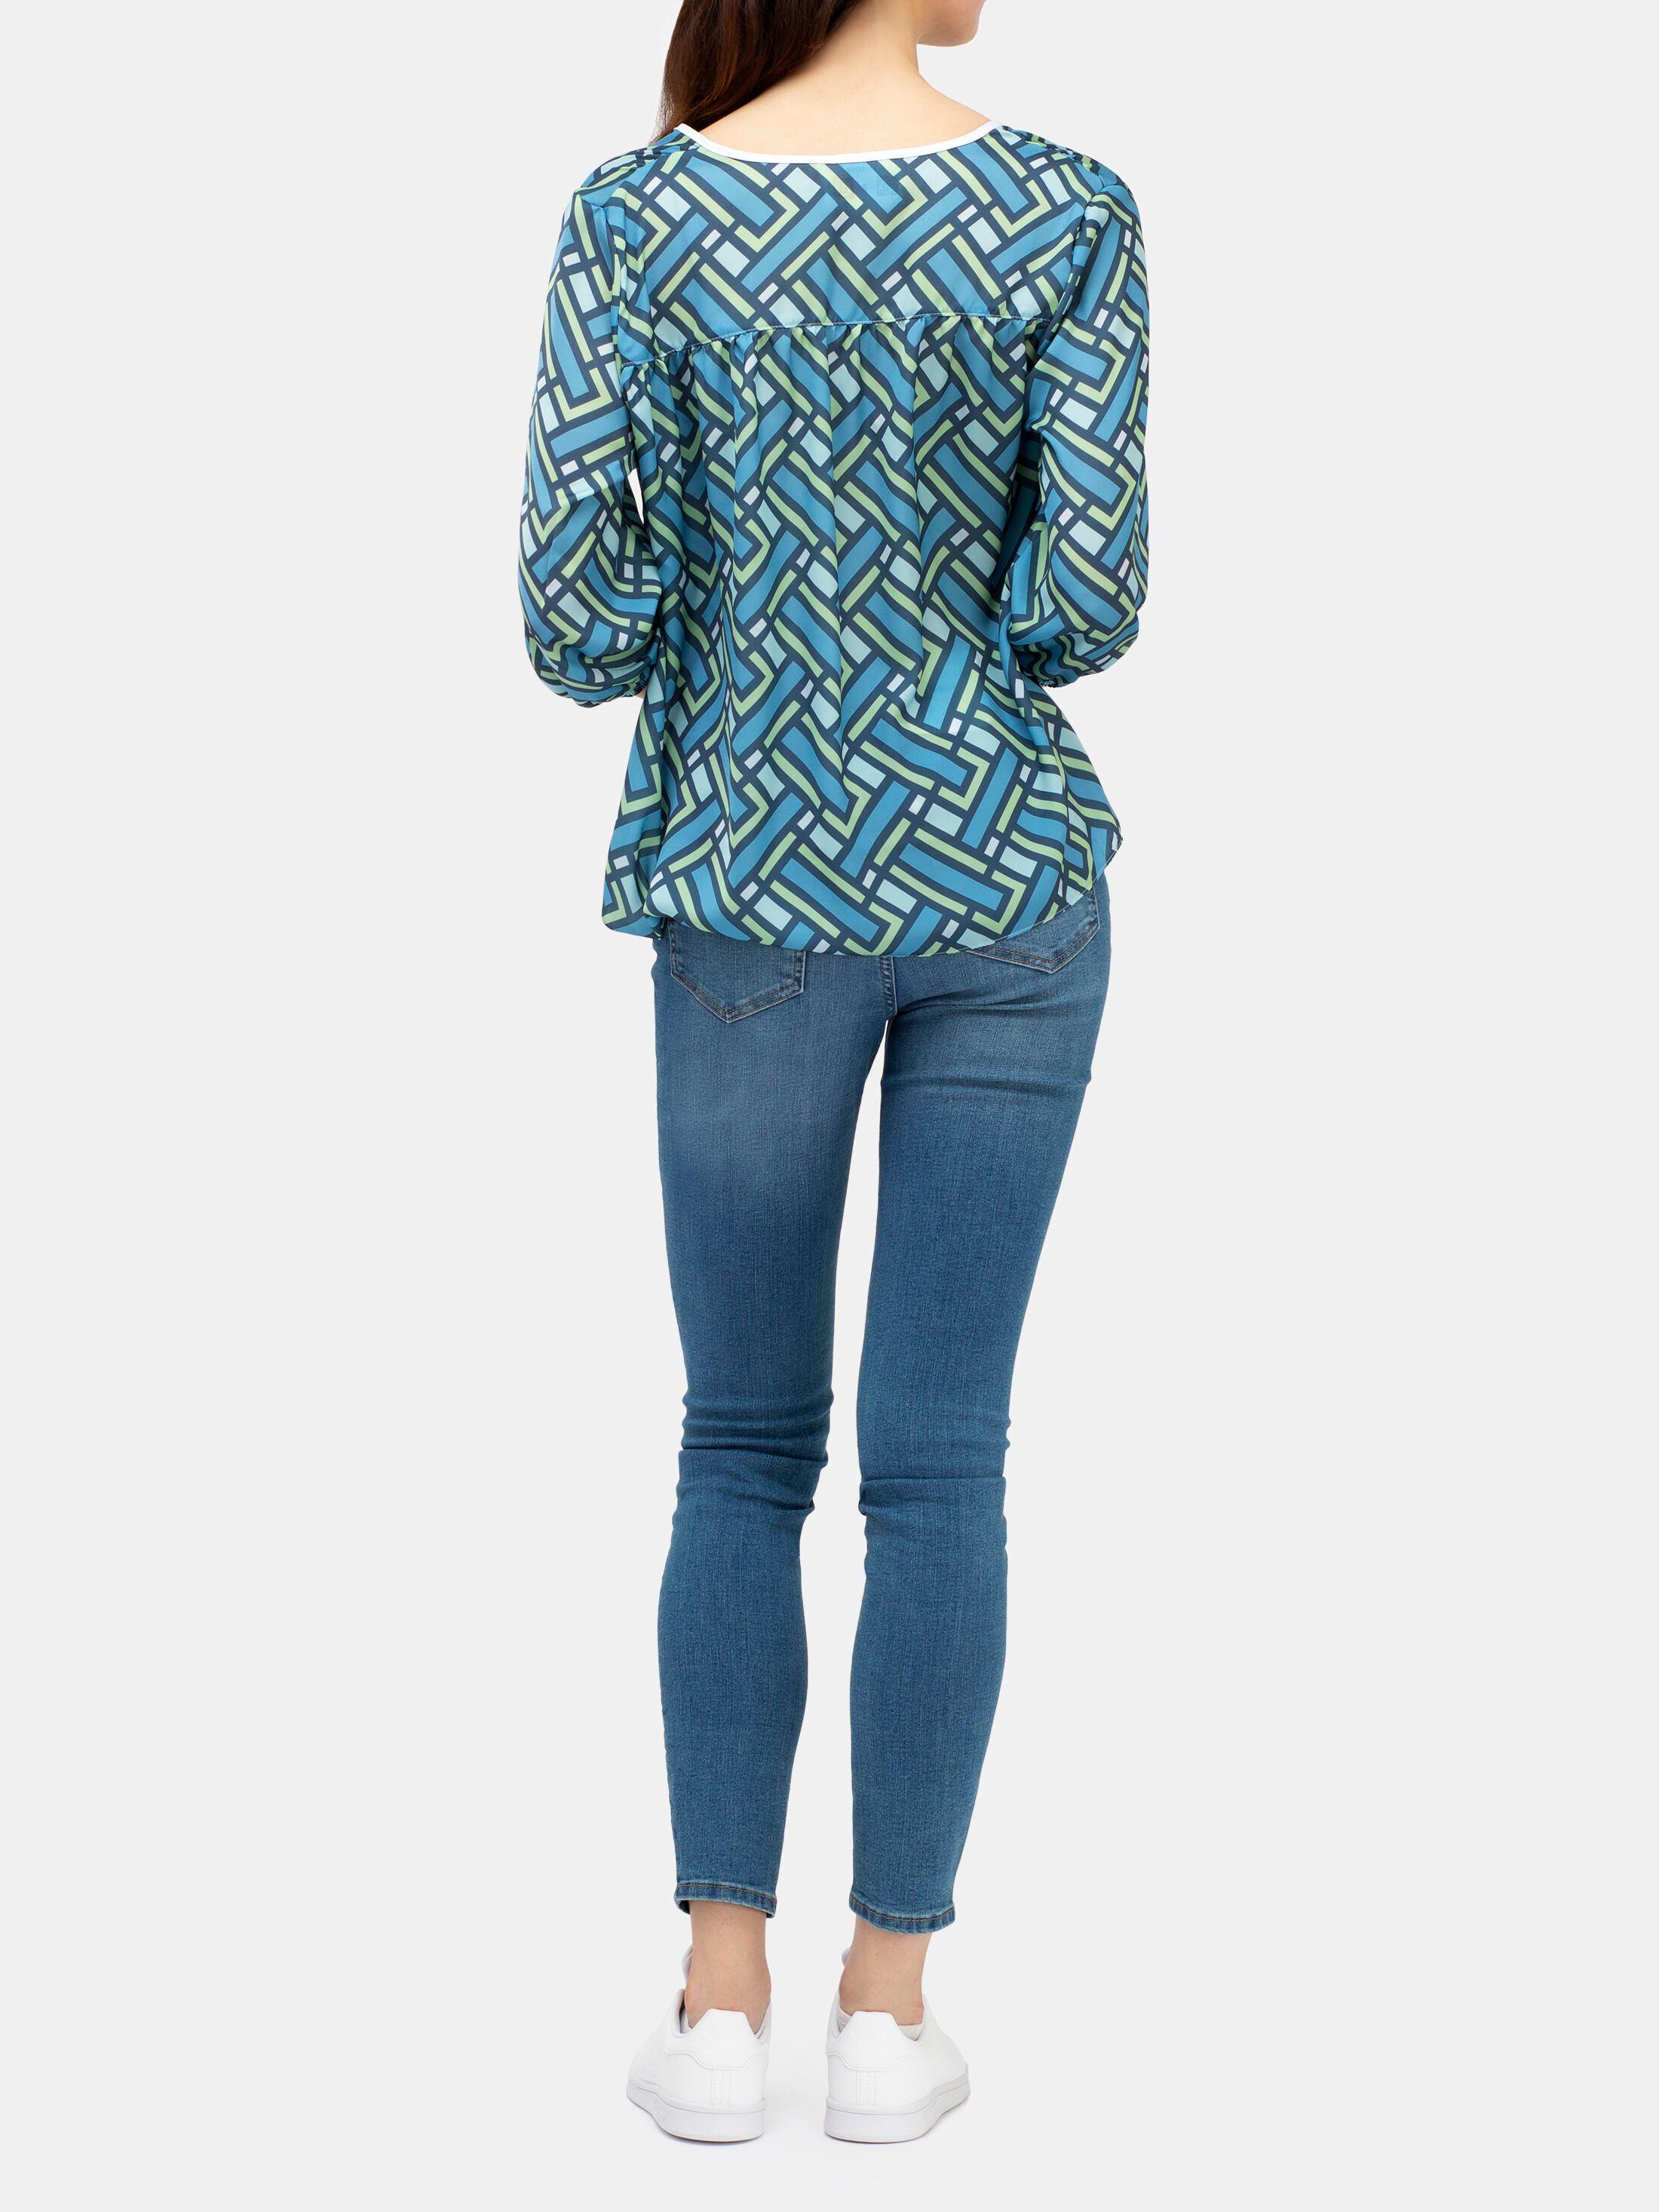 Designa din egen blus online